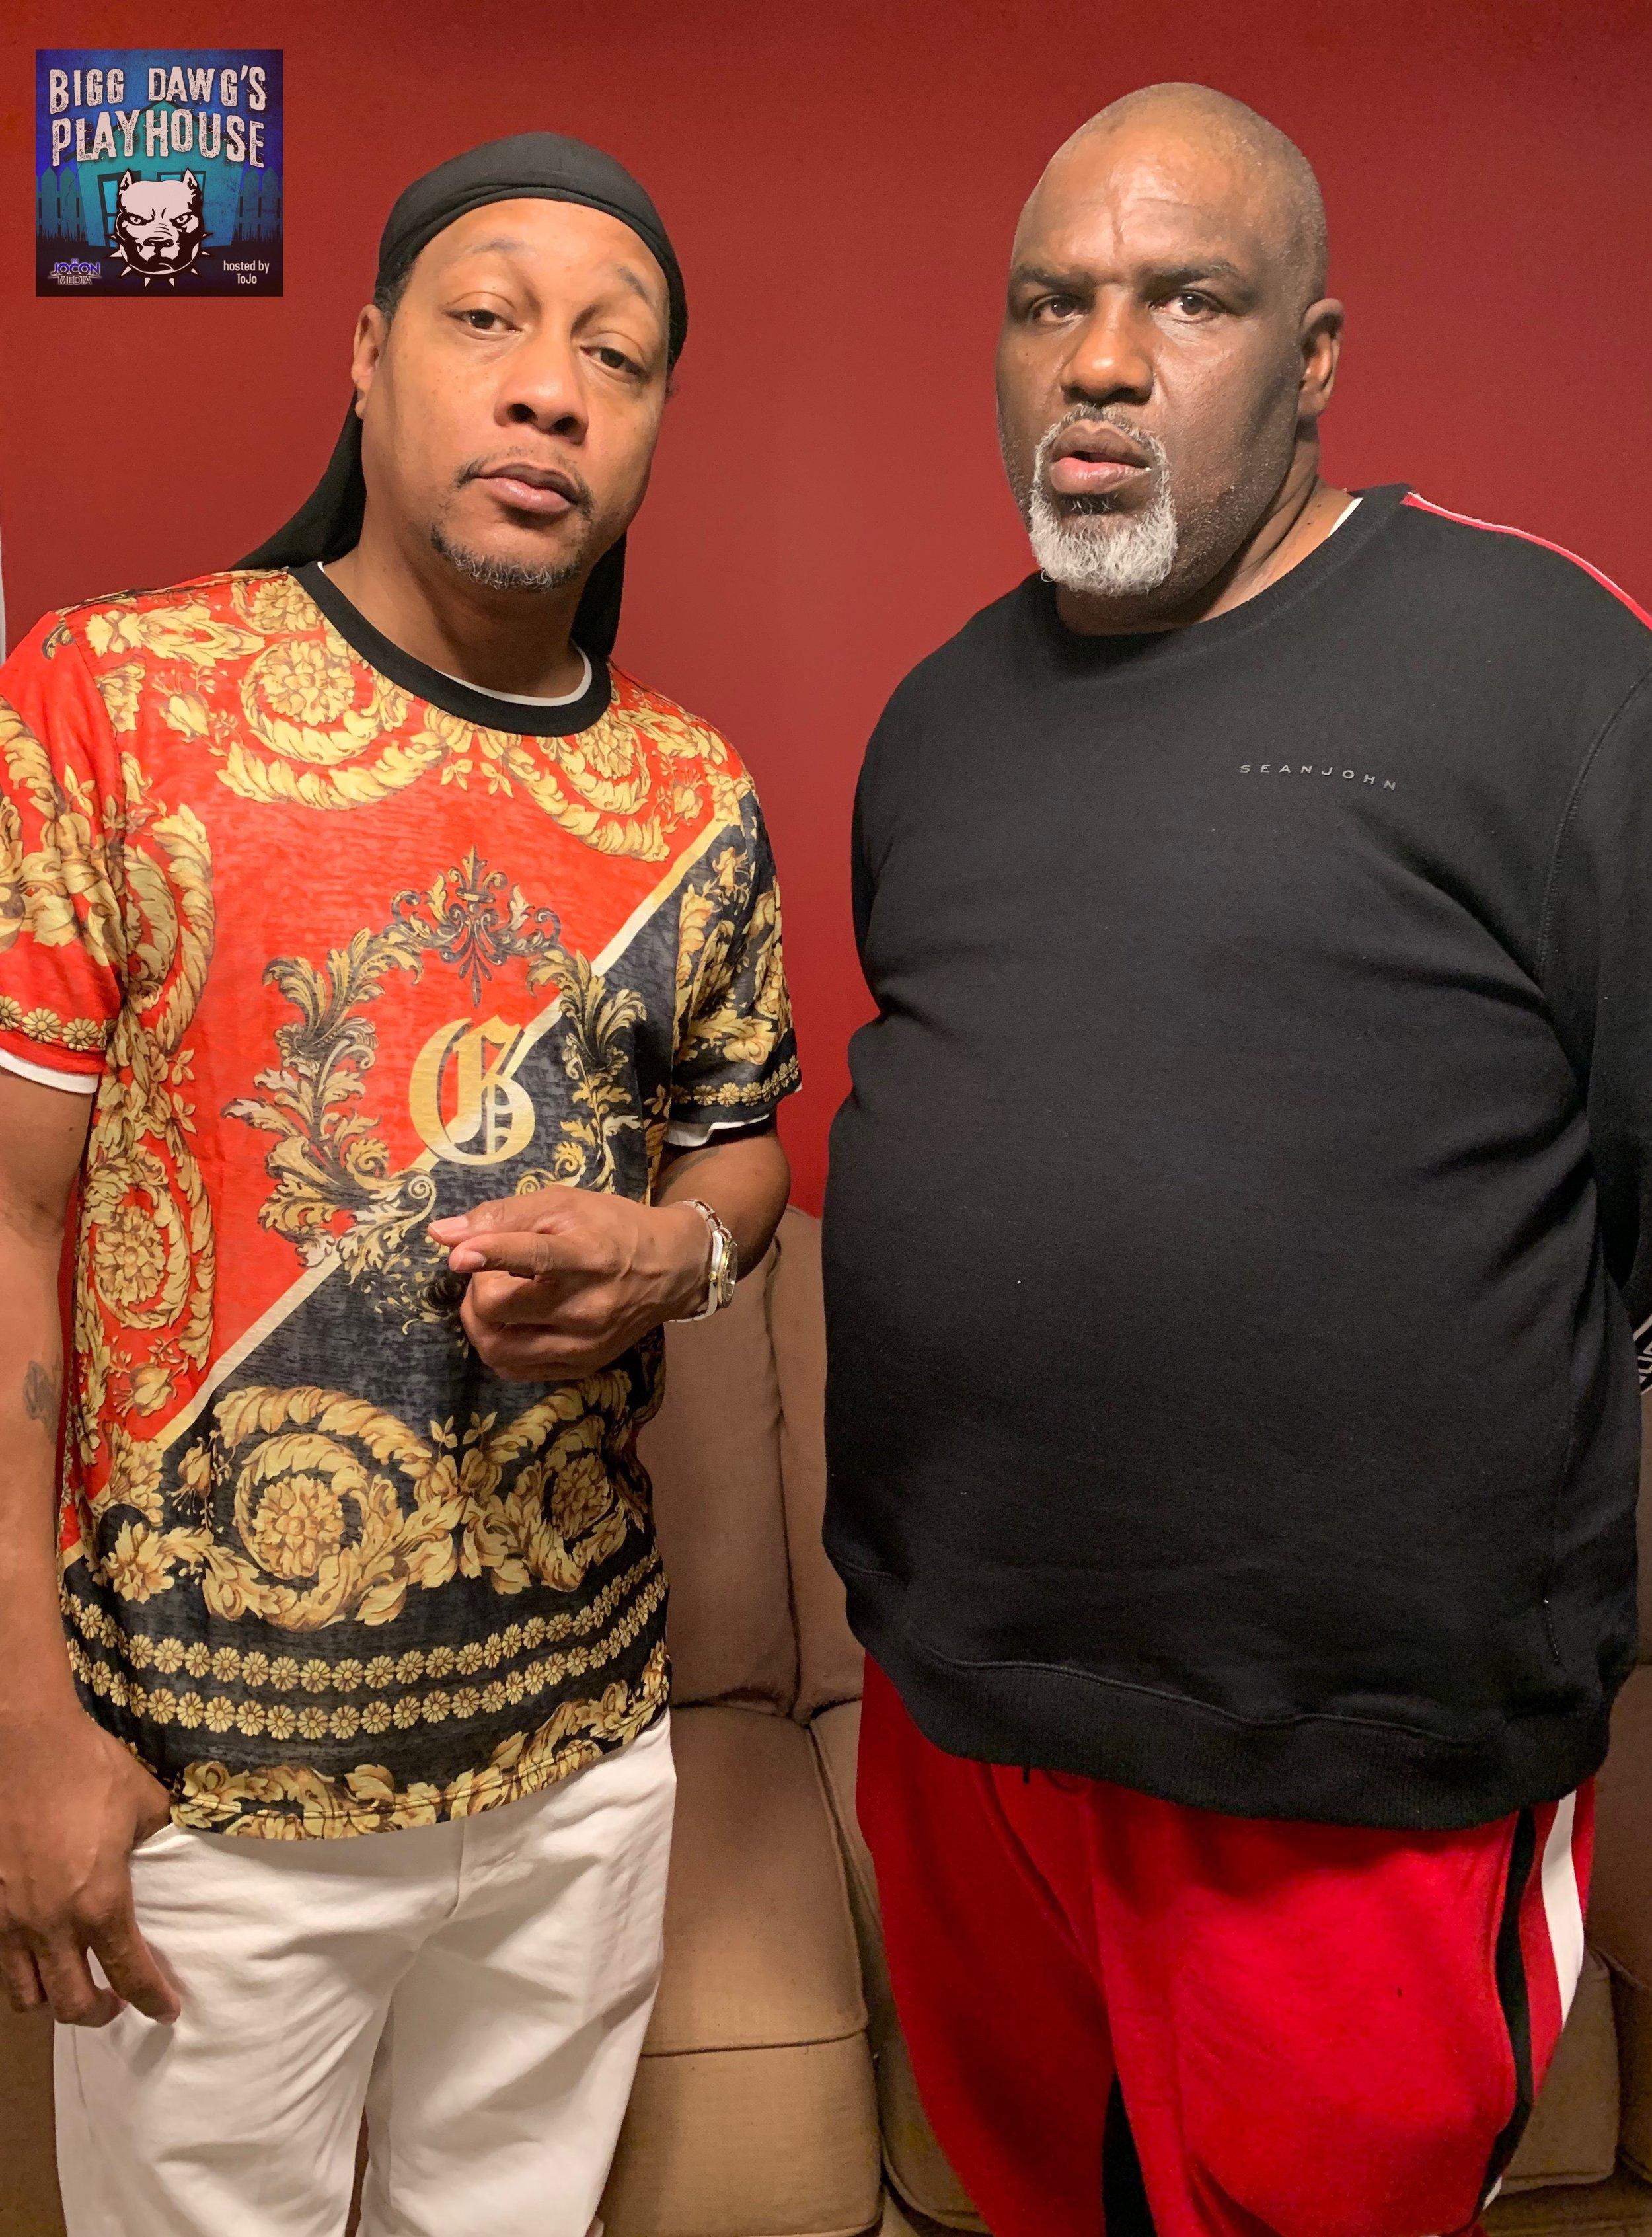 L to R: DJ Quik and Tojo